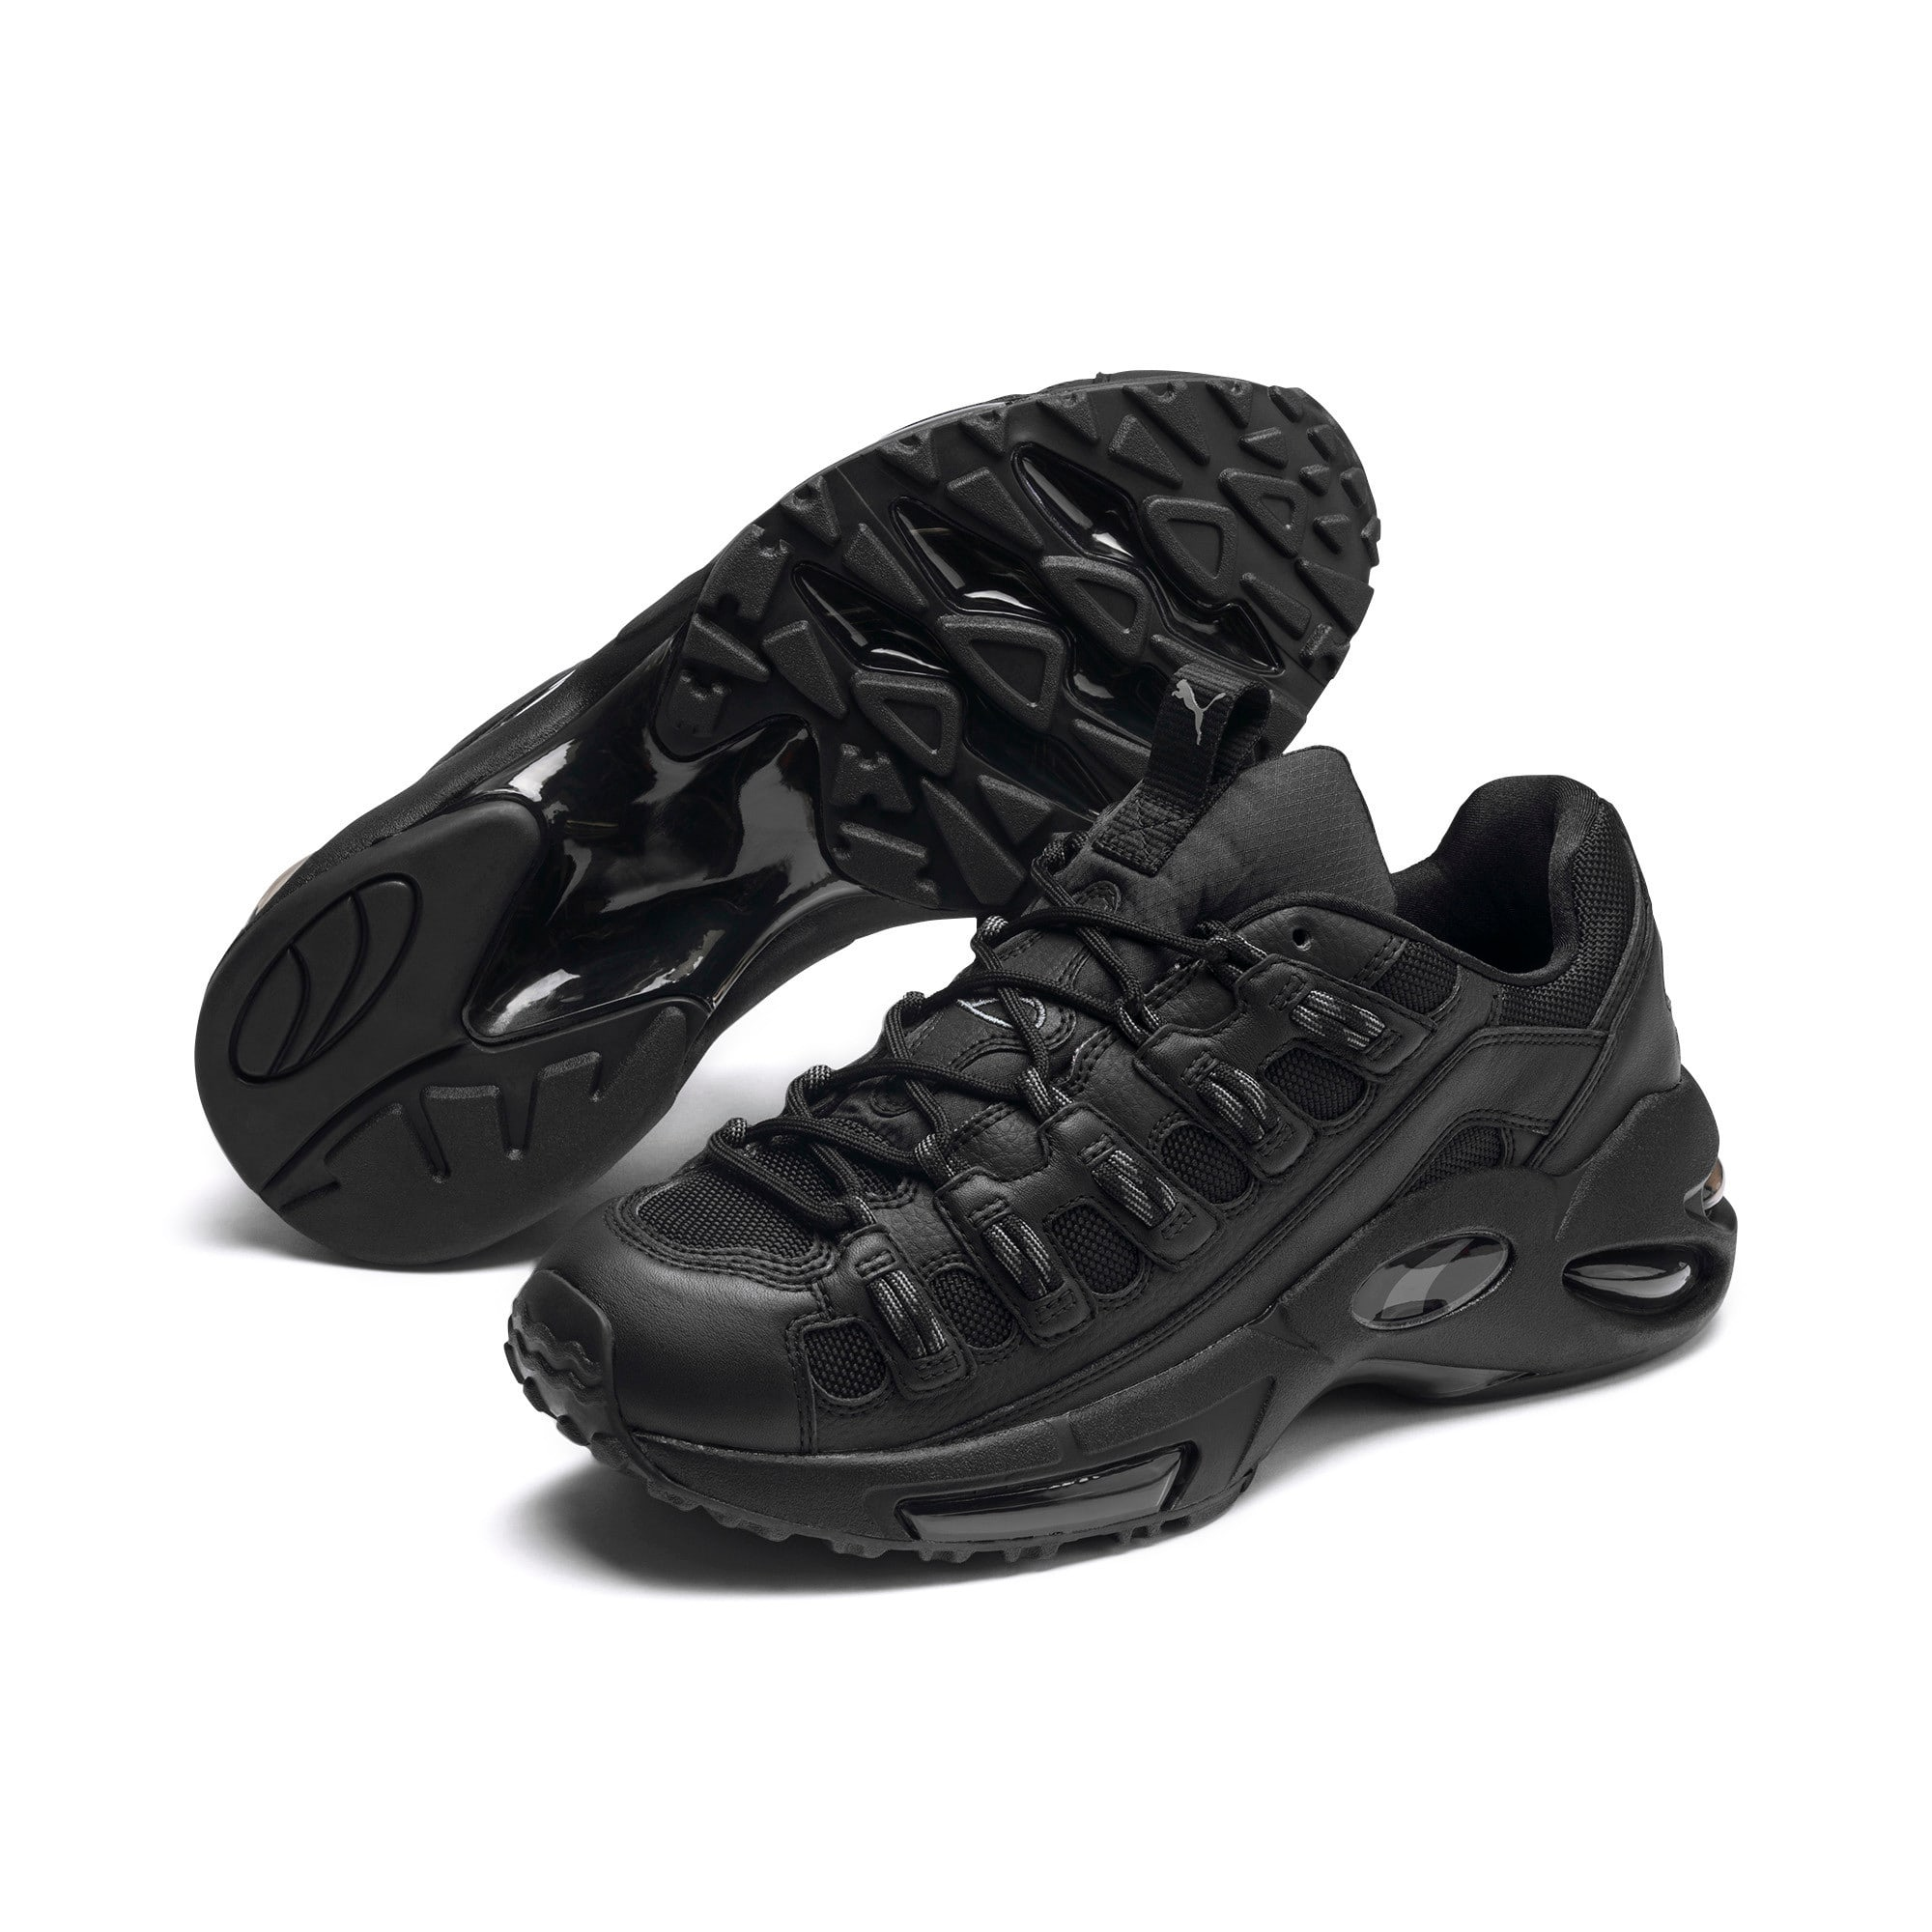 Thumbnail 3 of CELL Endura Rebound Sneakers, Puma Black-Puma Black, medium